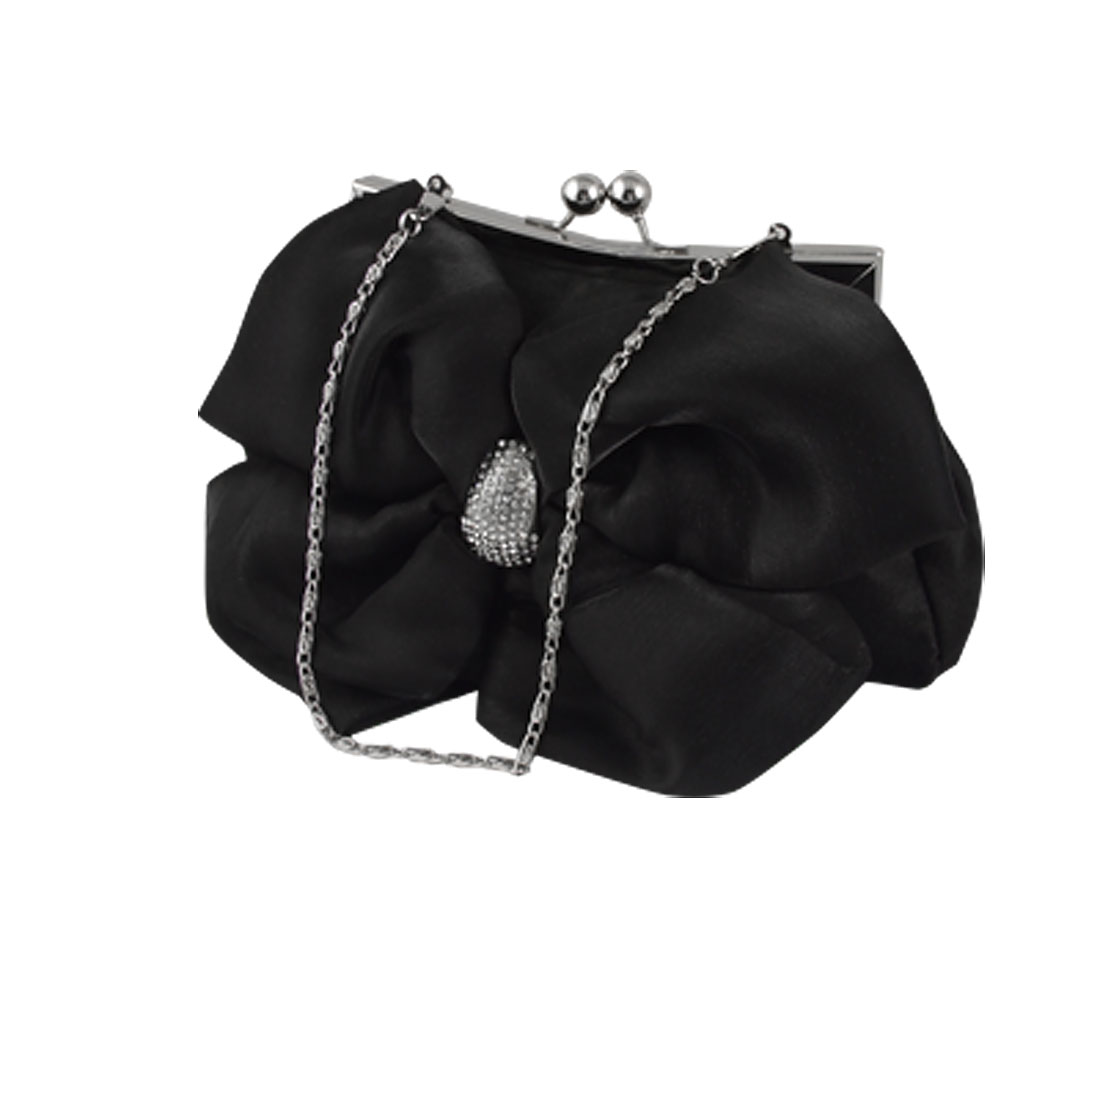 Kiss Lock Clasp Rhinestones Bowknot Bridal Handbag Black for Women